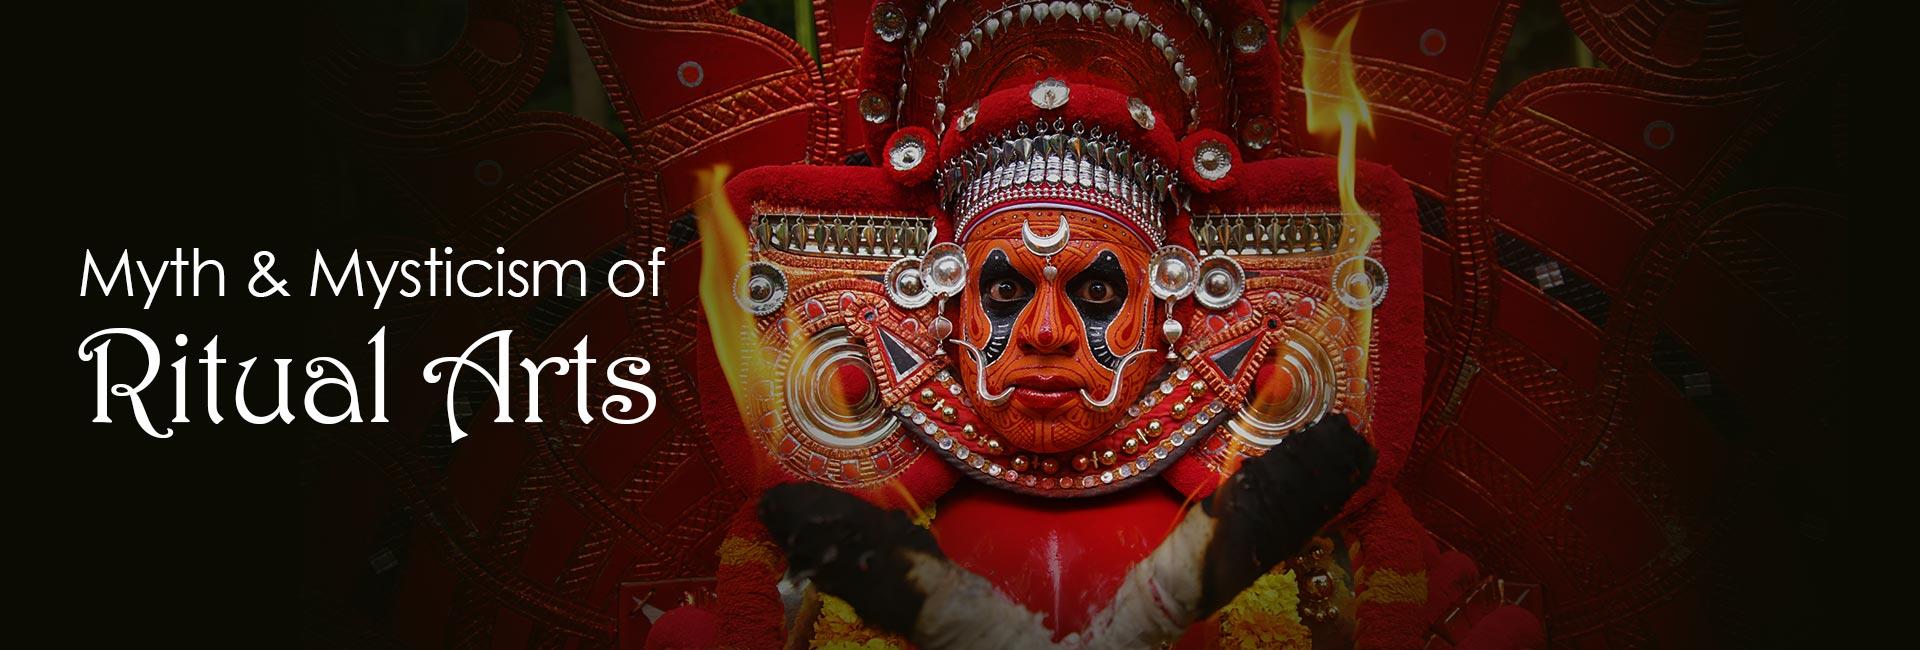 Myth & Mysticism of Ritual Arts